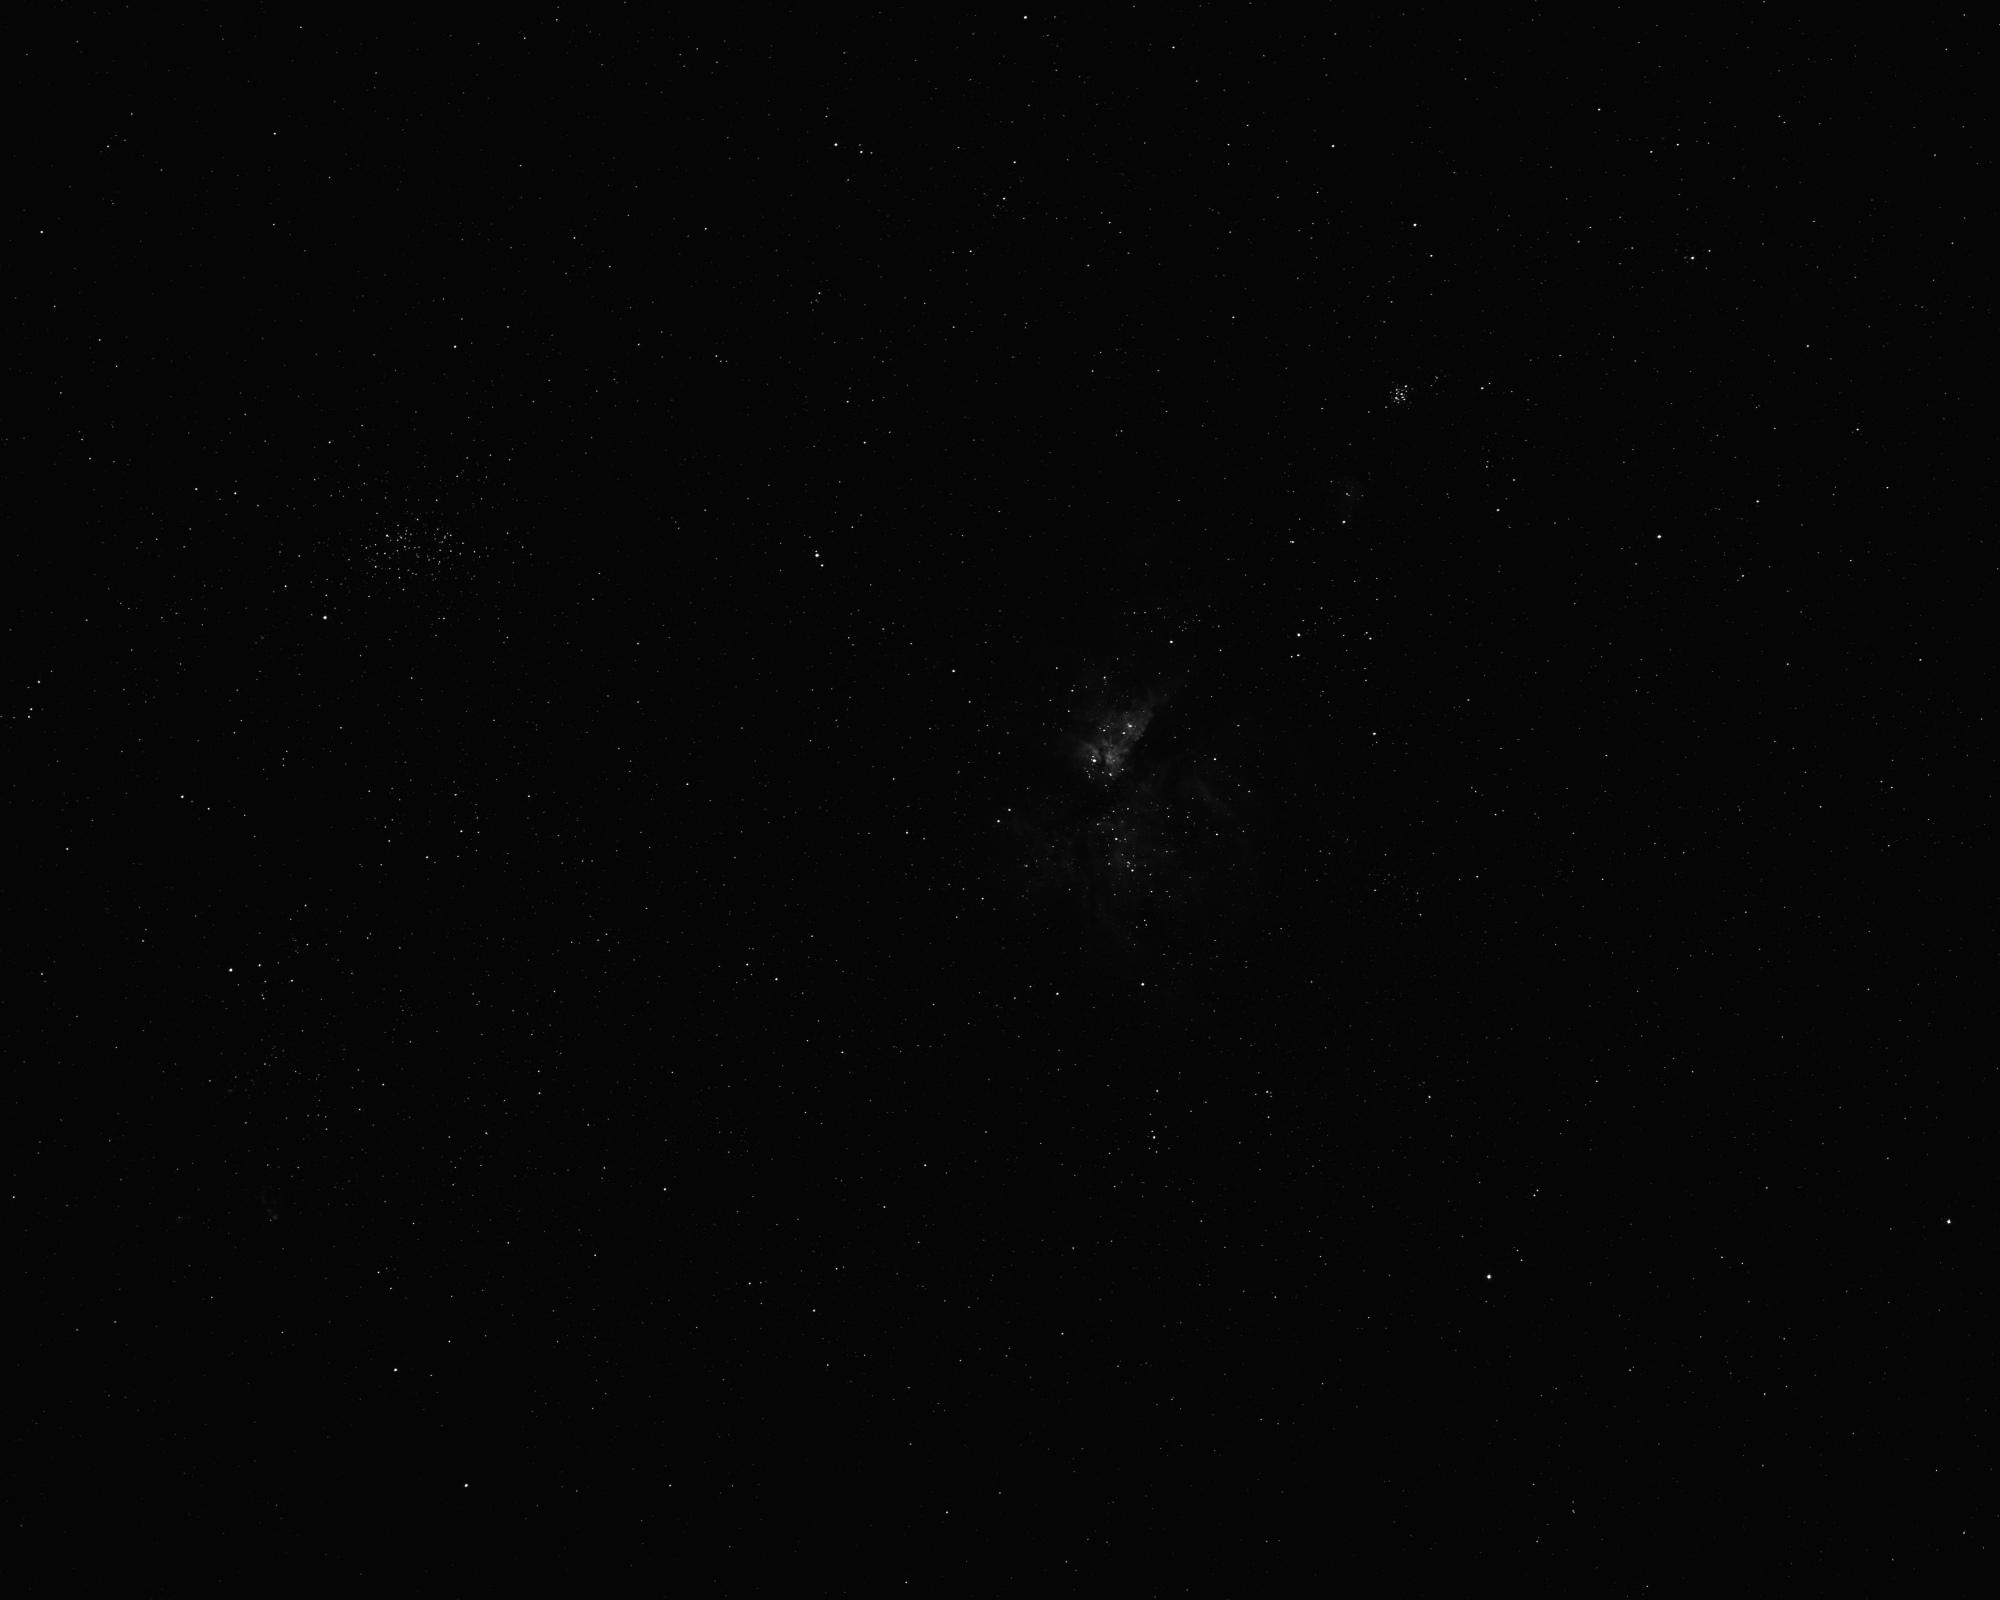 Carene-20191124@065317-600S-Oiii.jpg